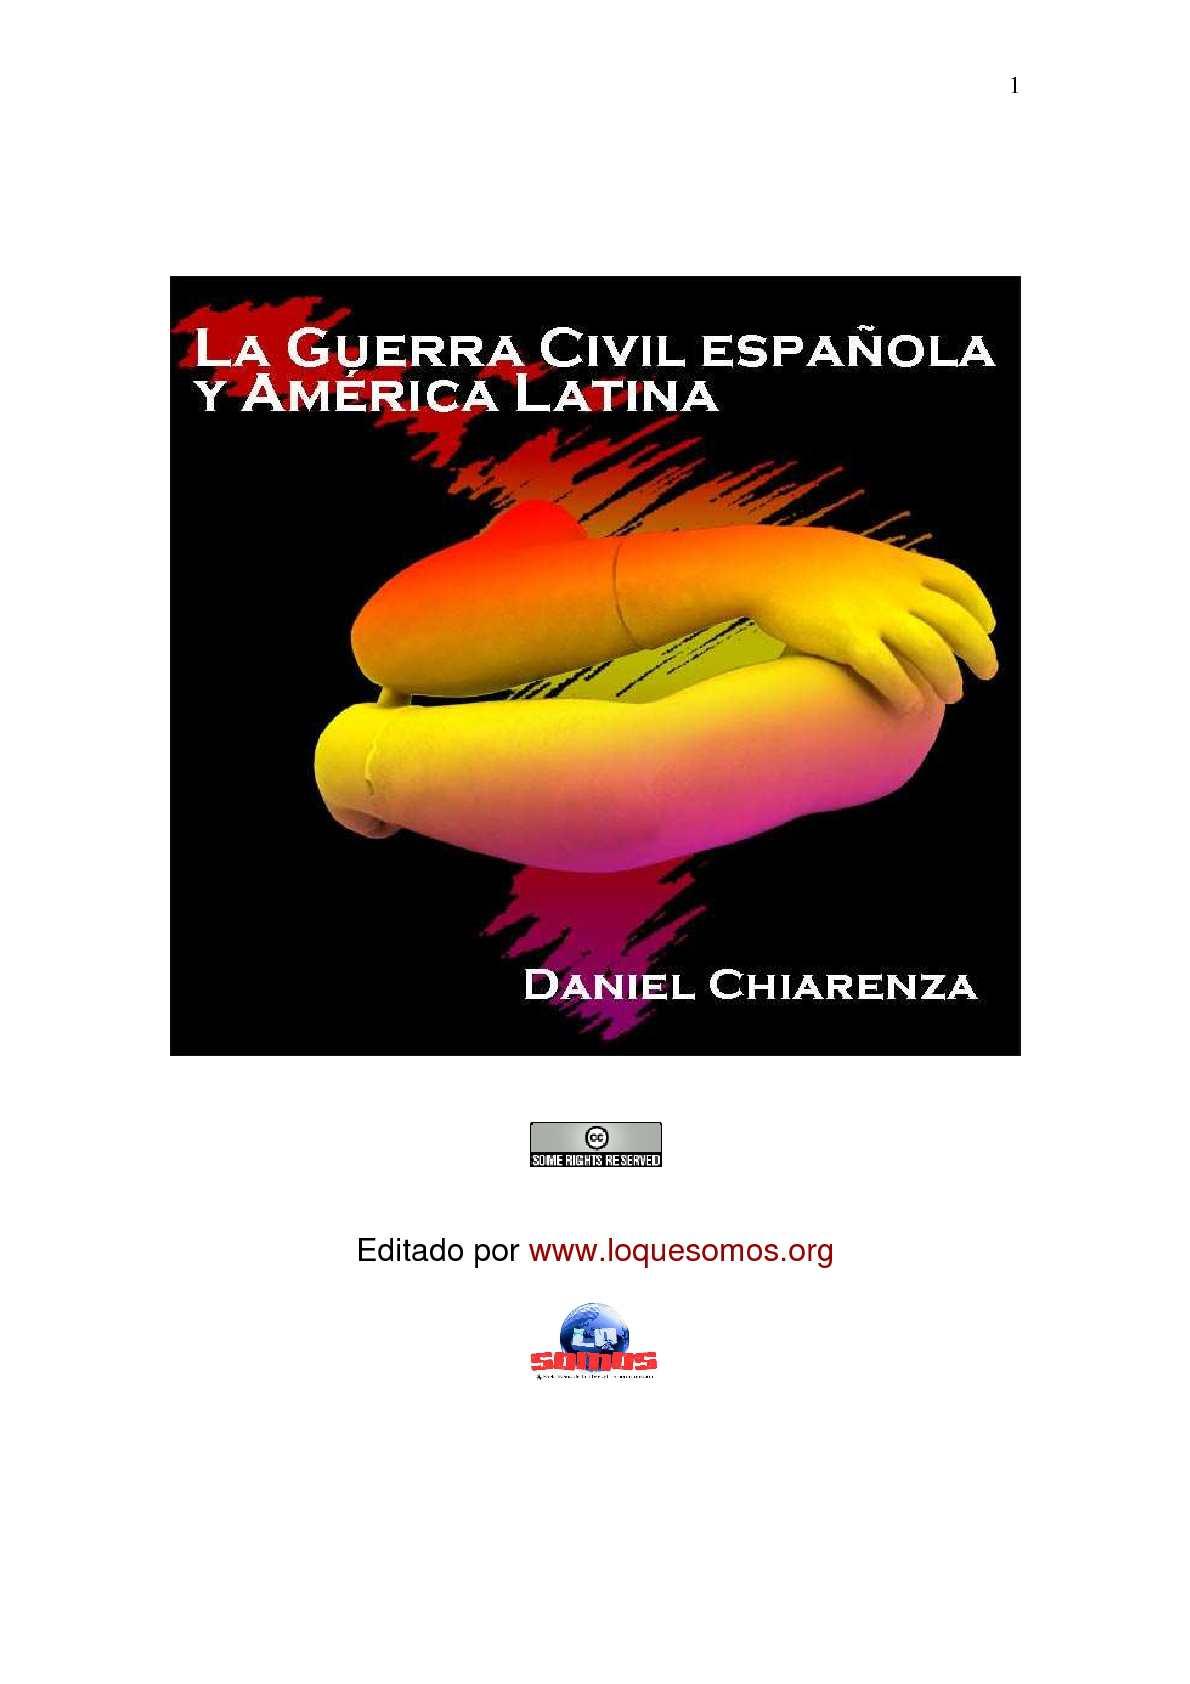 Calaméo - DANIEL CHIARENZA. La guerra civil española y América Latina